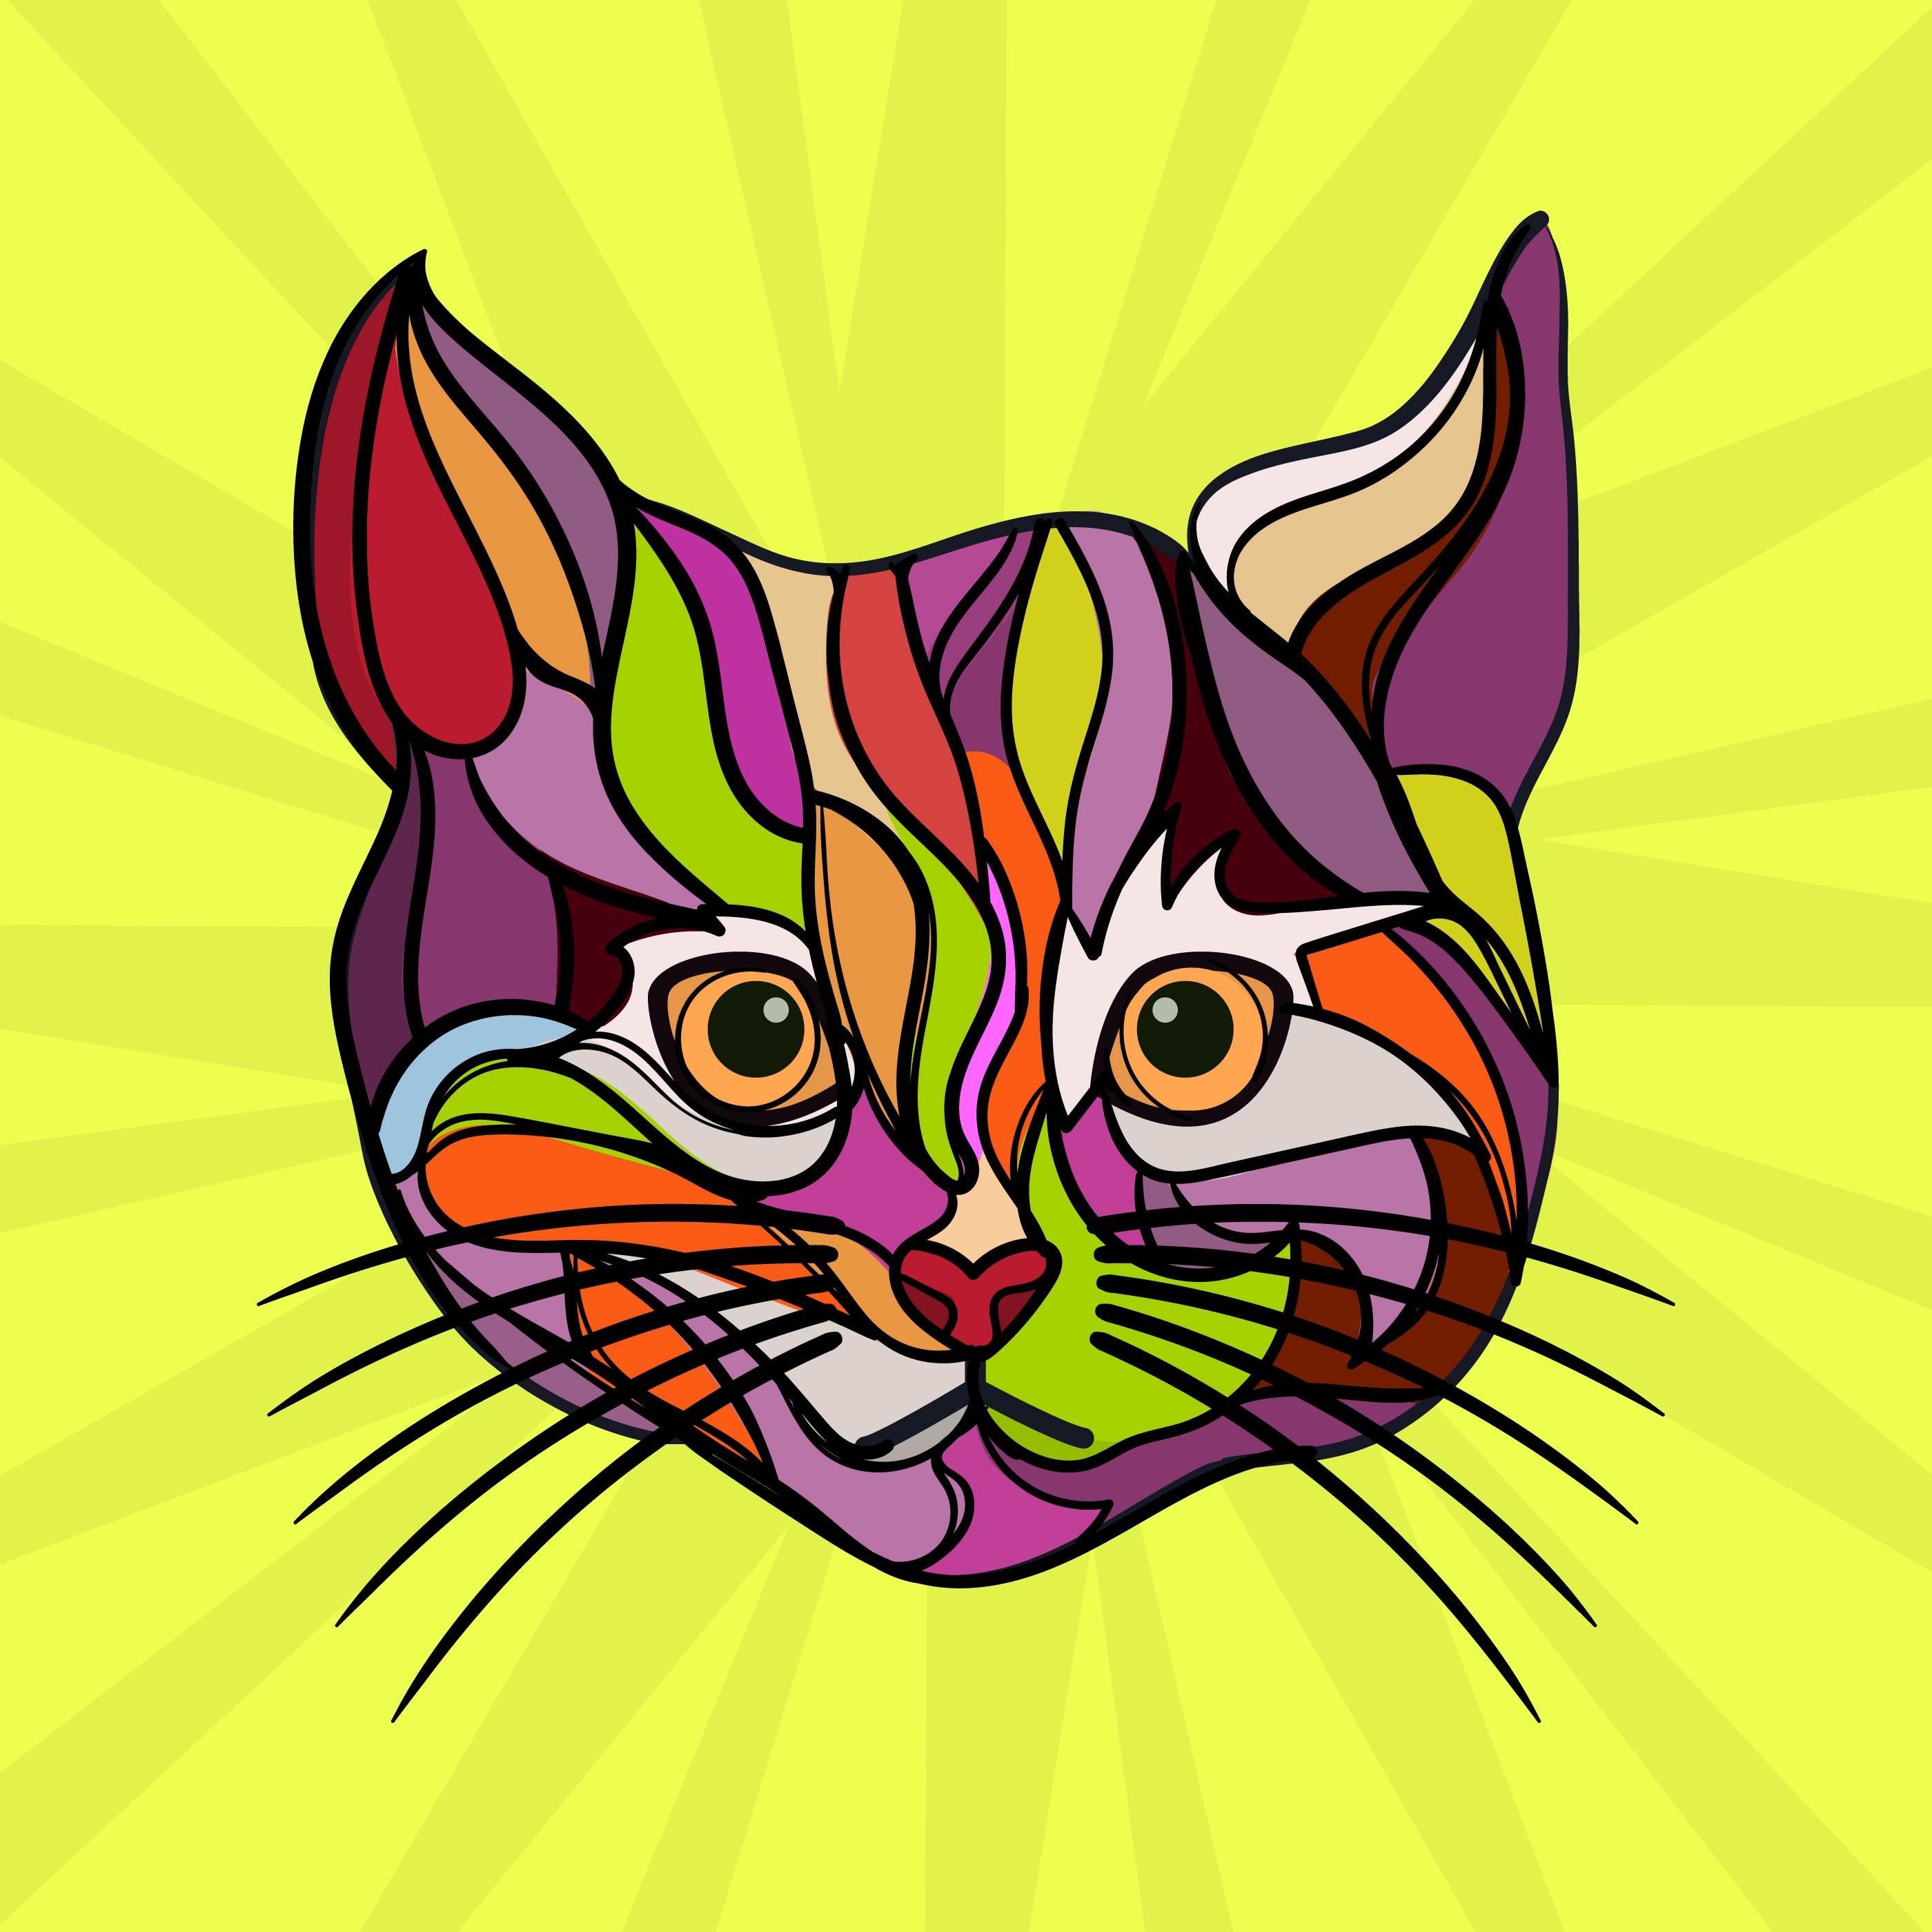 LEOPARD ART PRINT POSTER Design B Cat Animal Colorful Decor Illustration